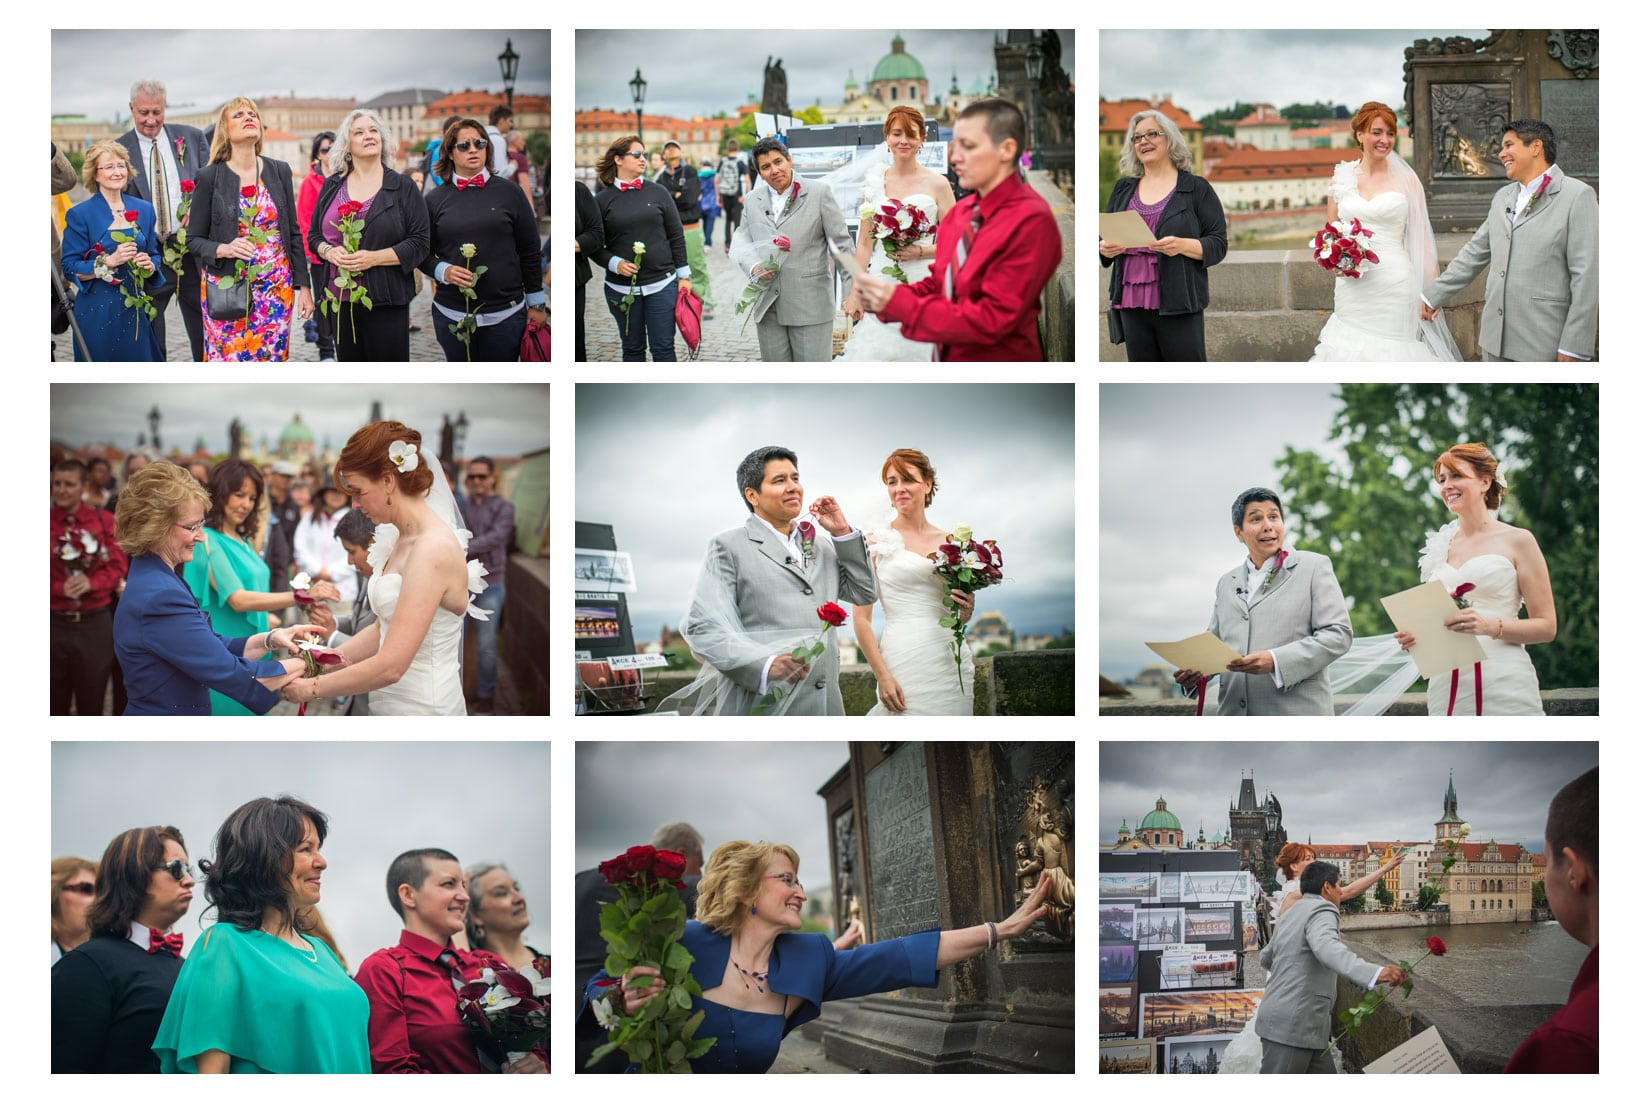 Charles Bridge Wedding / Kimberly & Jules / wedding party